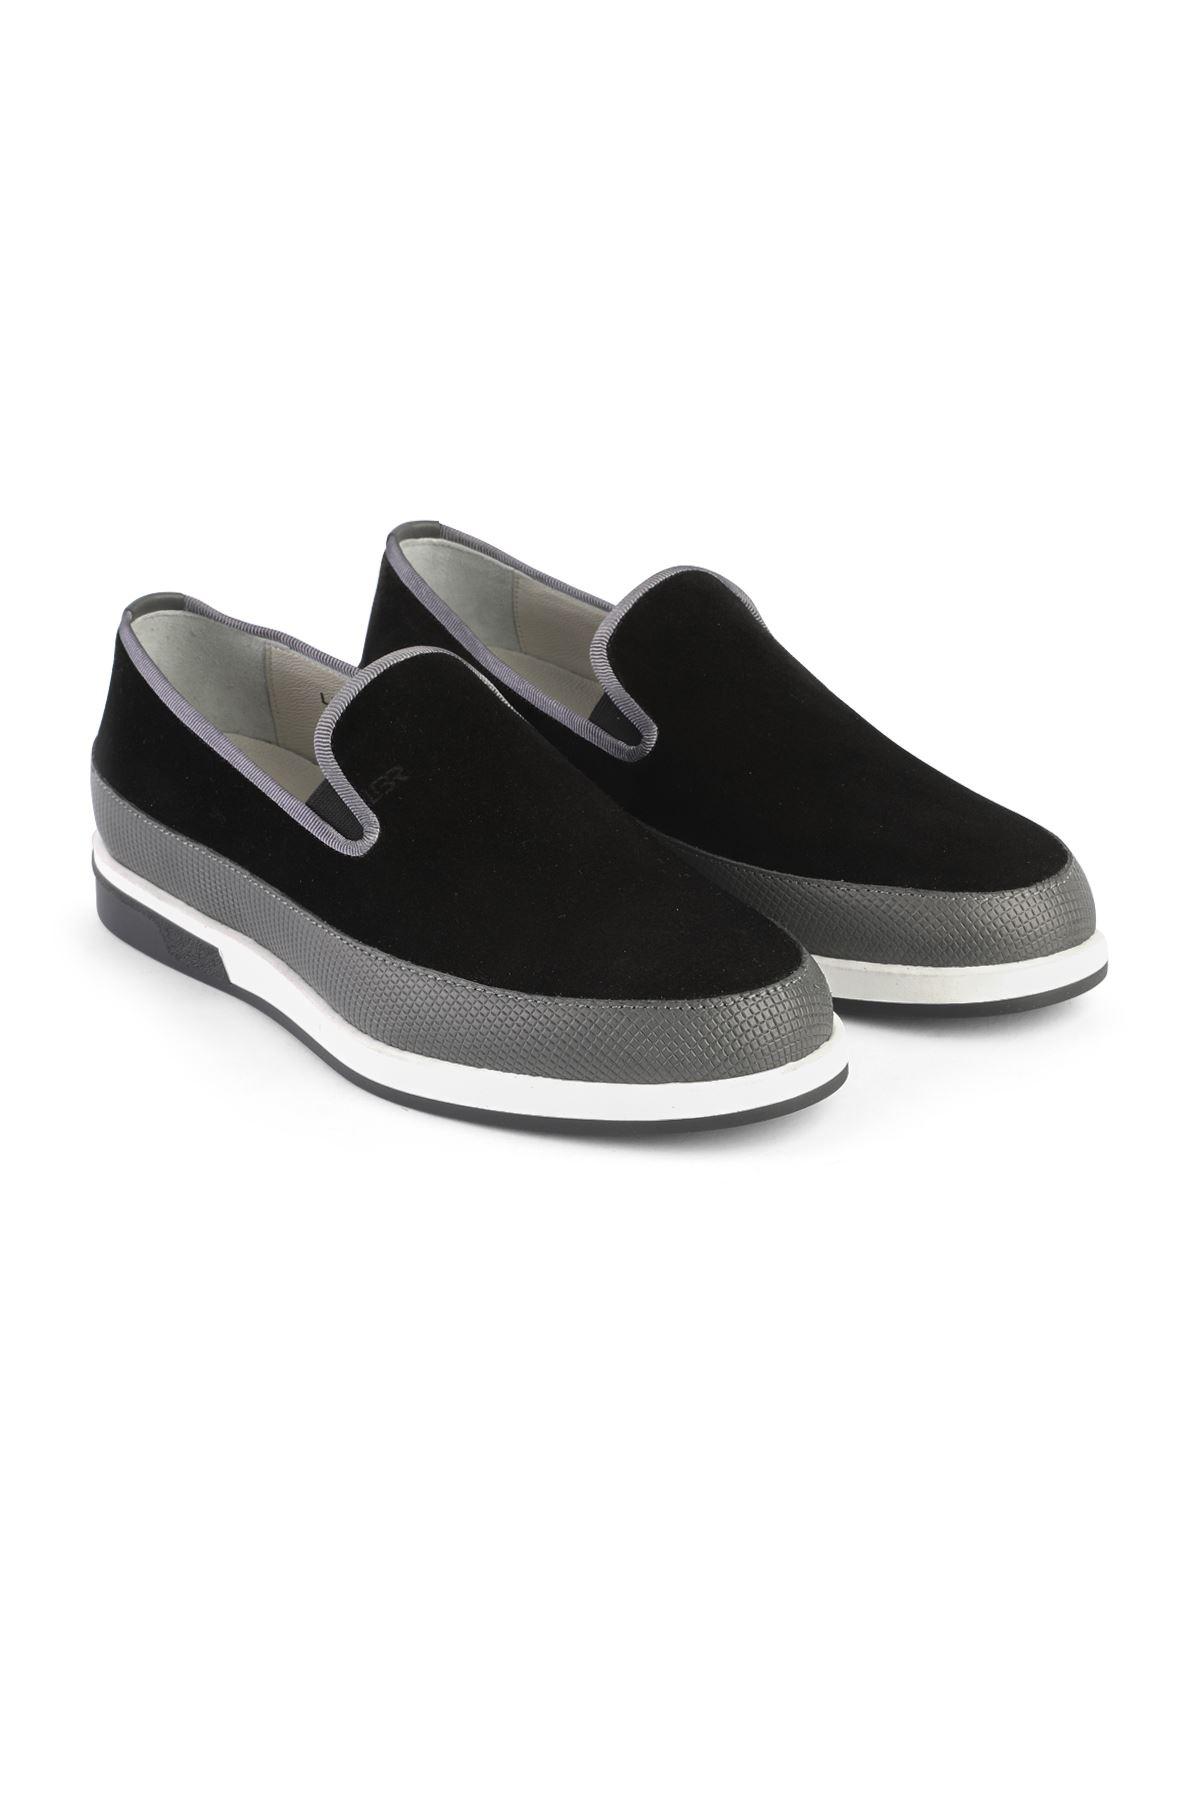 Libero 3368 Black Loafer Shoes